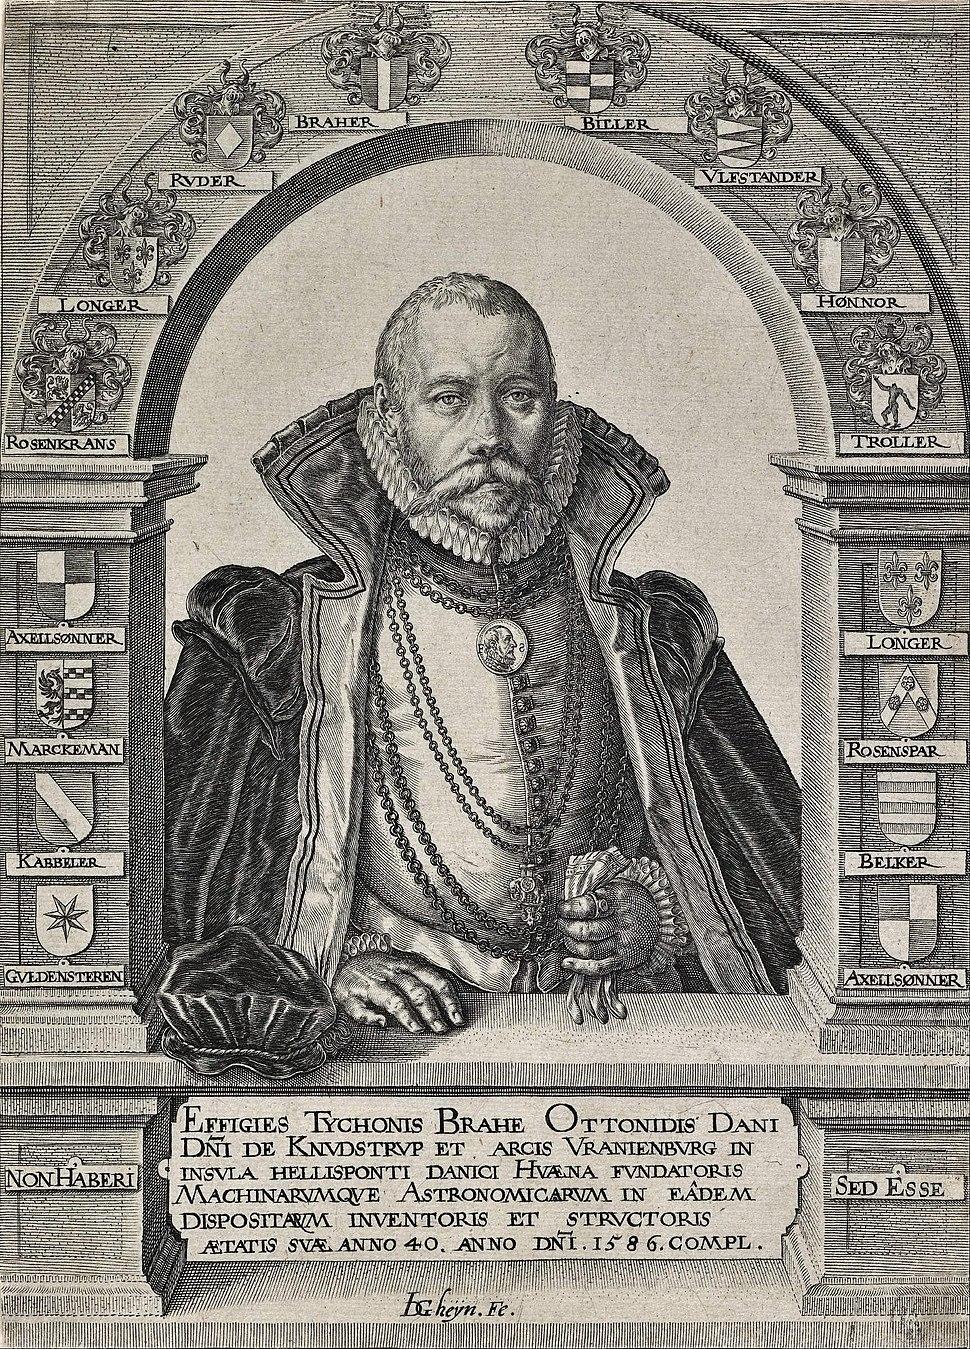 Jacques de Gheyn Ii - Portrait of Tycho Brahe, astronomer (without a hat) - Google Art Project